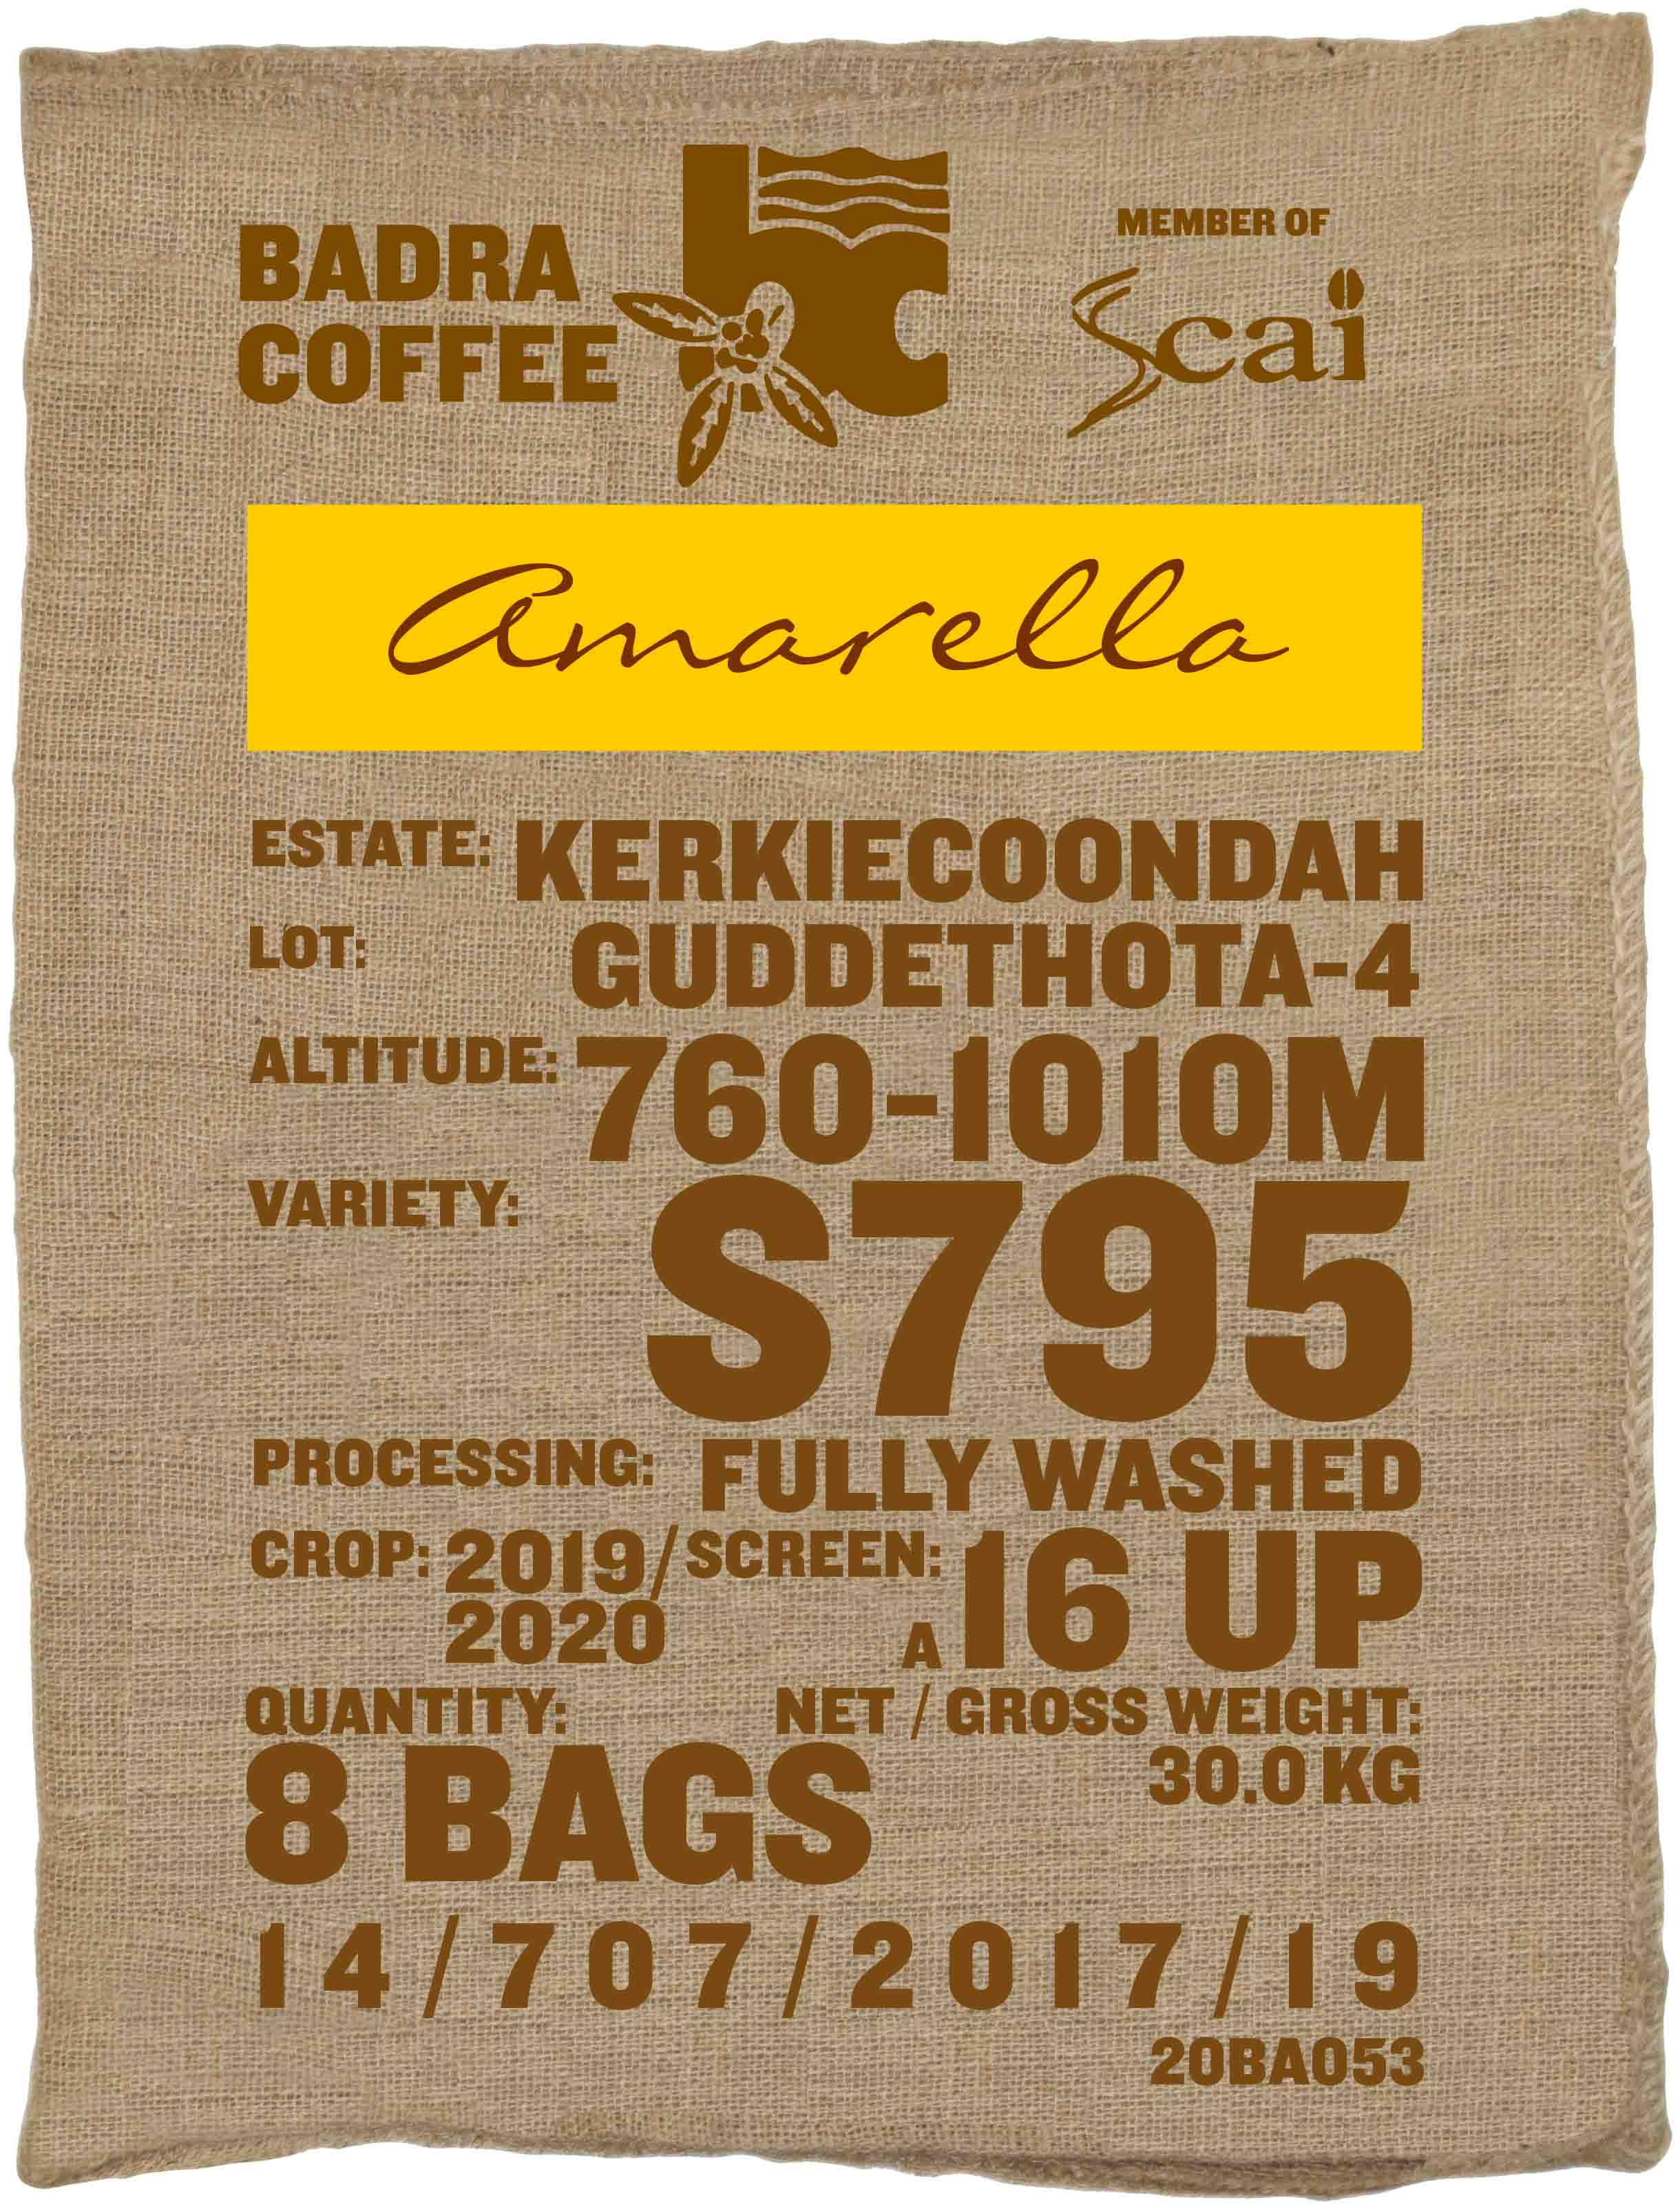 Ein Rohkaffeesack amarella Parzellenkaffe Varietät S795. Badra Estates Lot Guddethota 4.